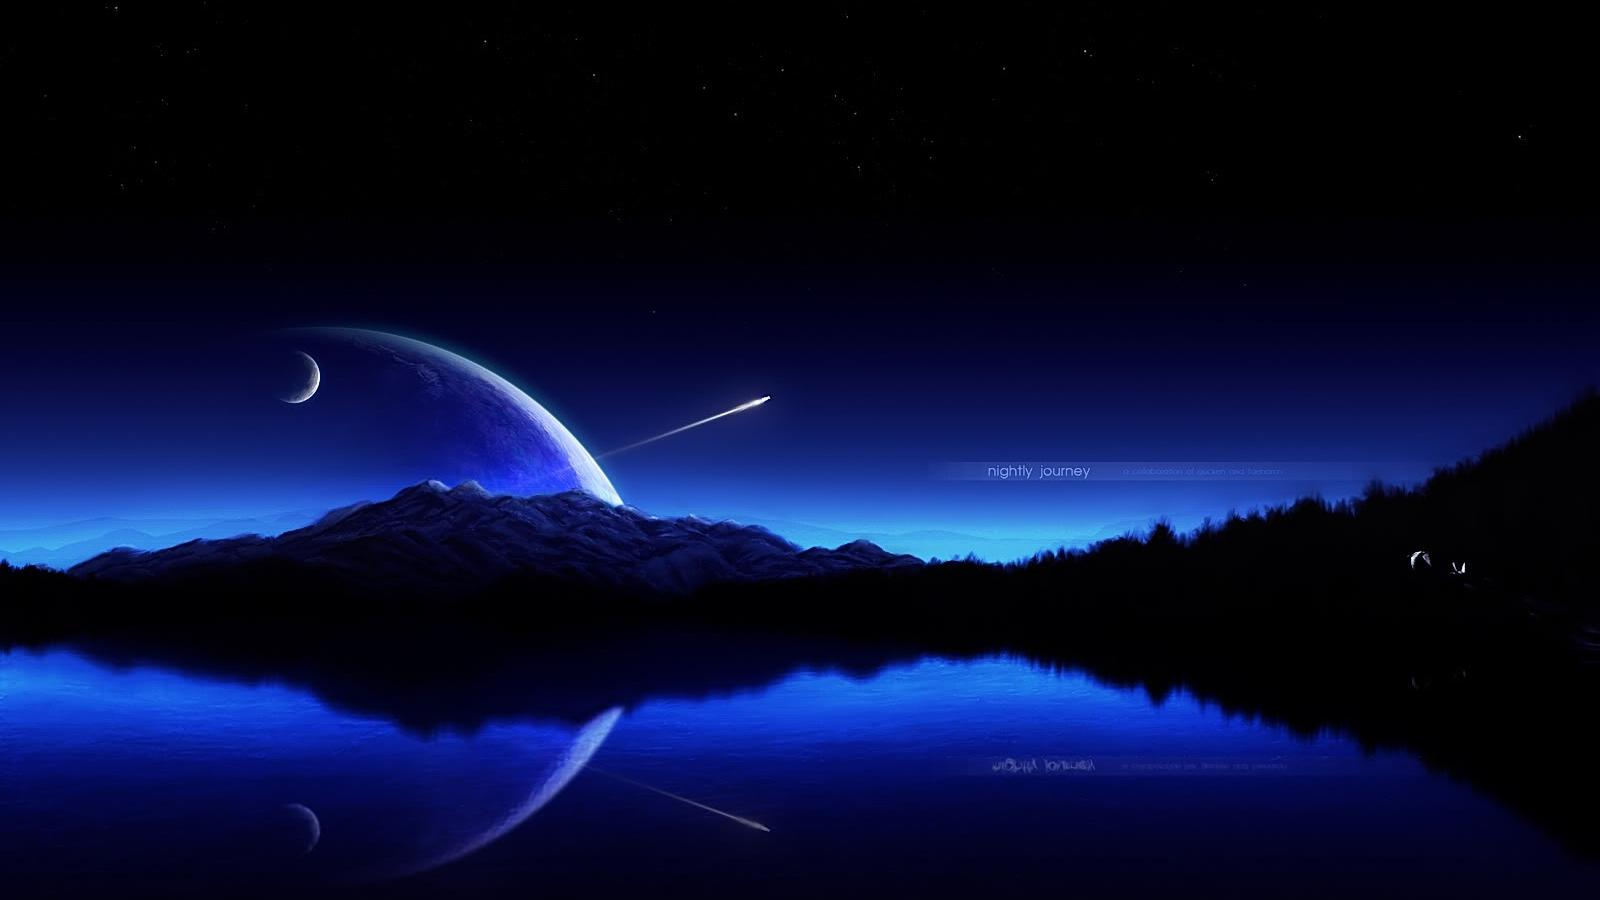 moon over water images wallpaper moon over water pics moon 1600x900